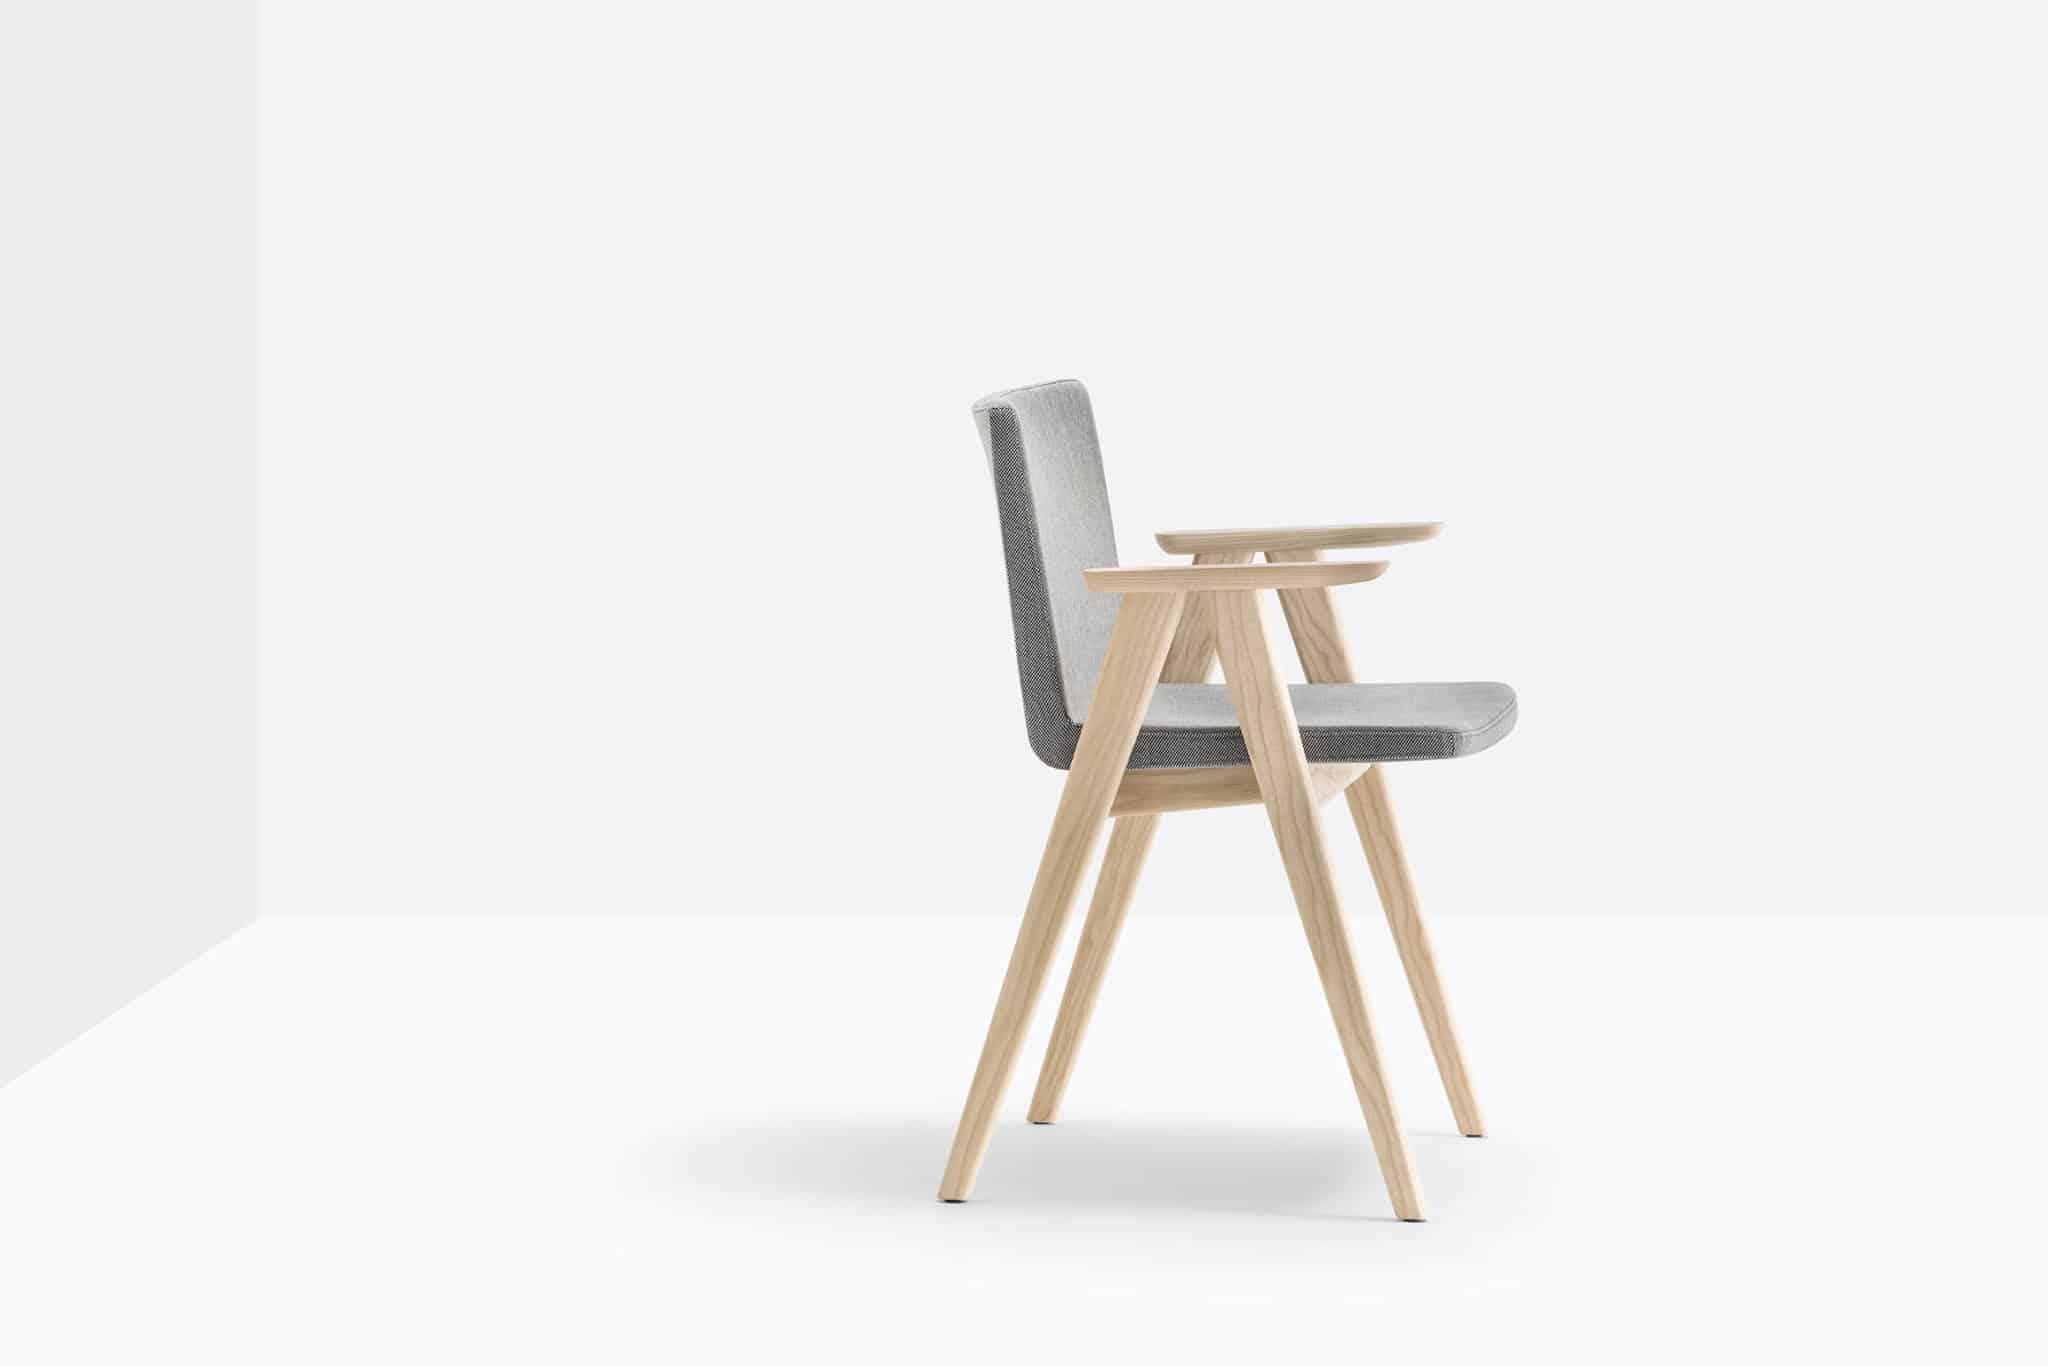 PEDRALI OSAKA 2816 fauteuil bois recouvert de tissu